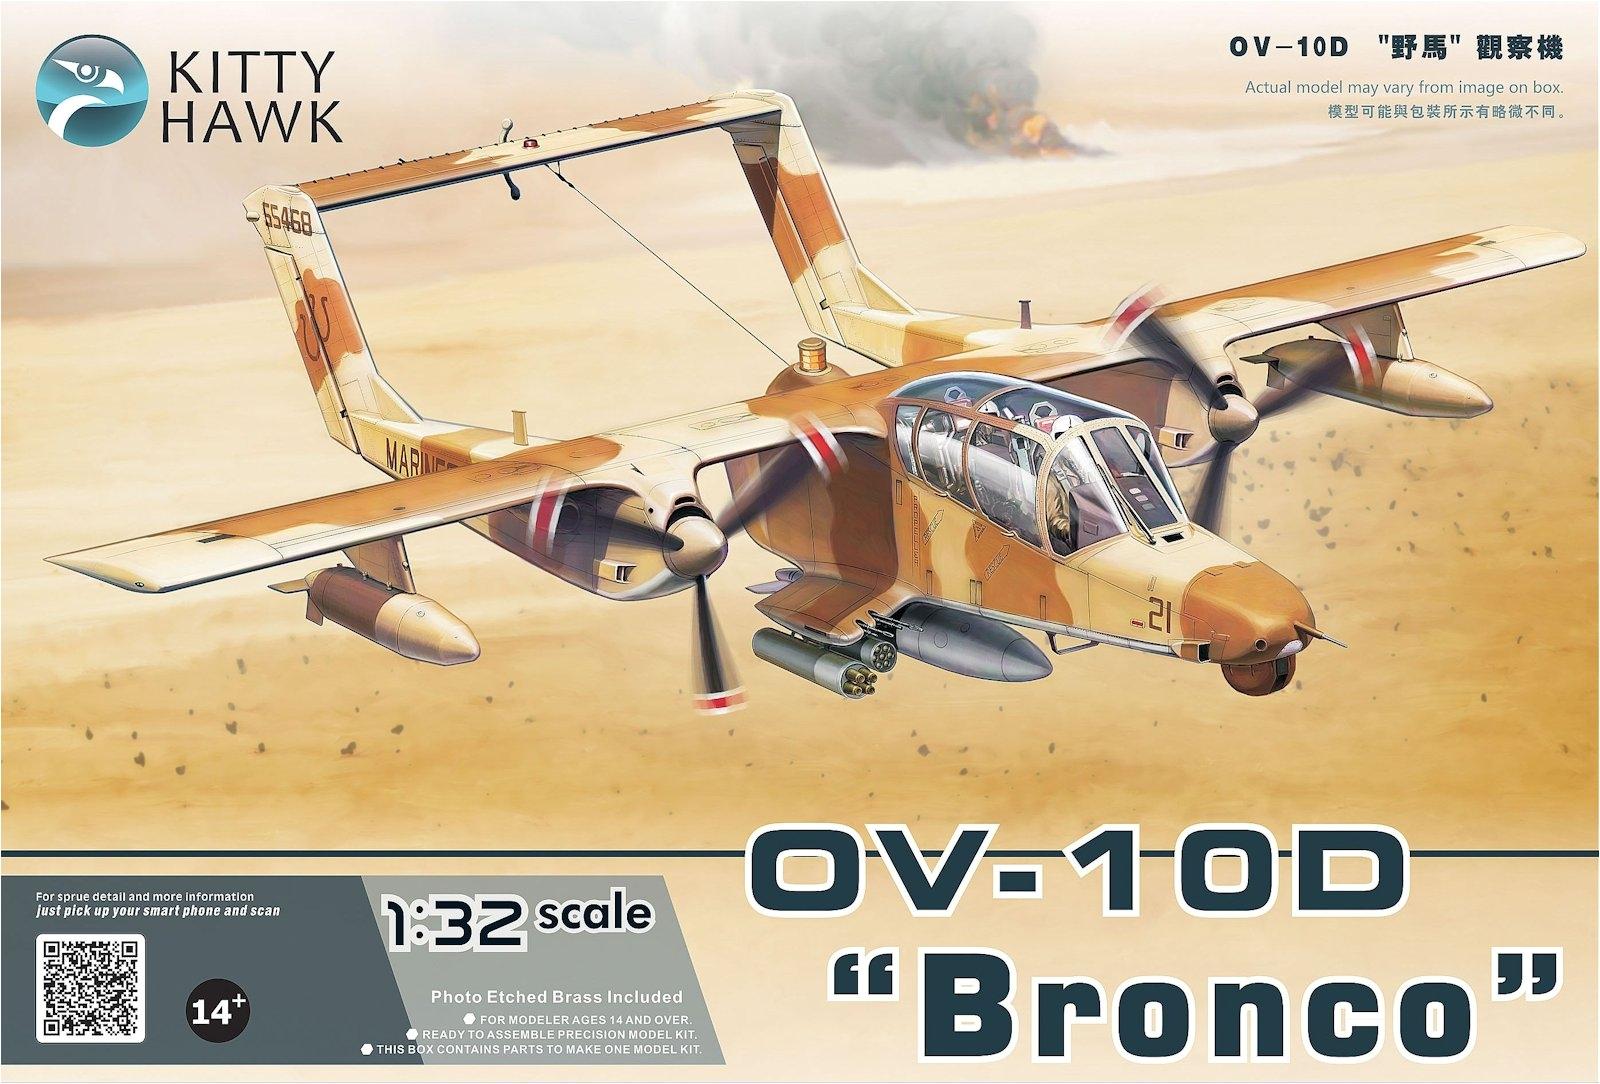 Tiger Hawk Floor Machine the Modelling News Big Buckin Bronco Built Up Kittyhawks 32nd Ov